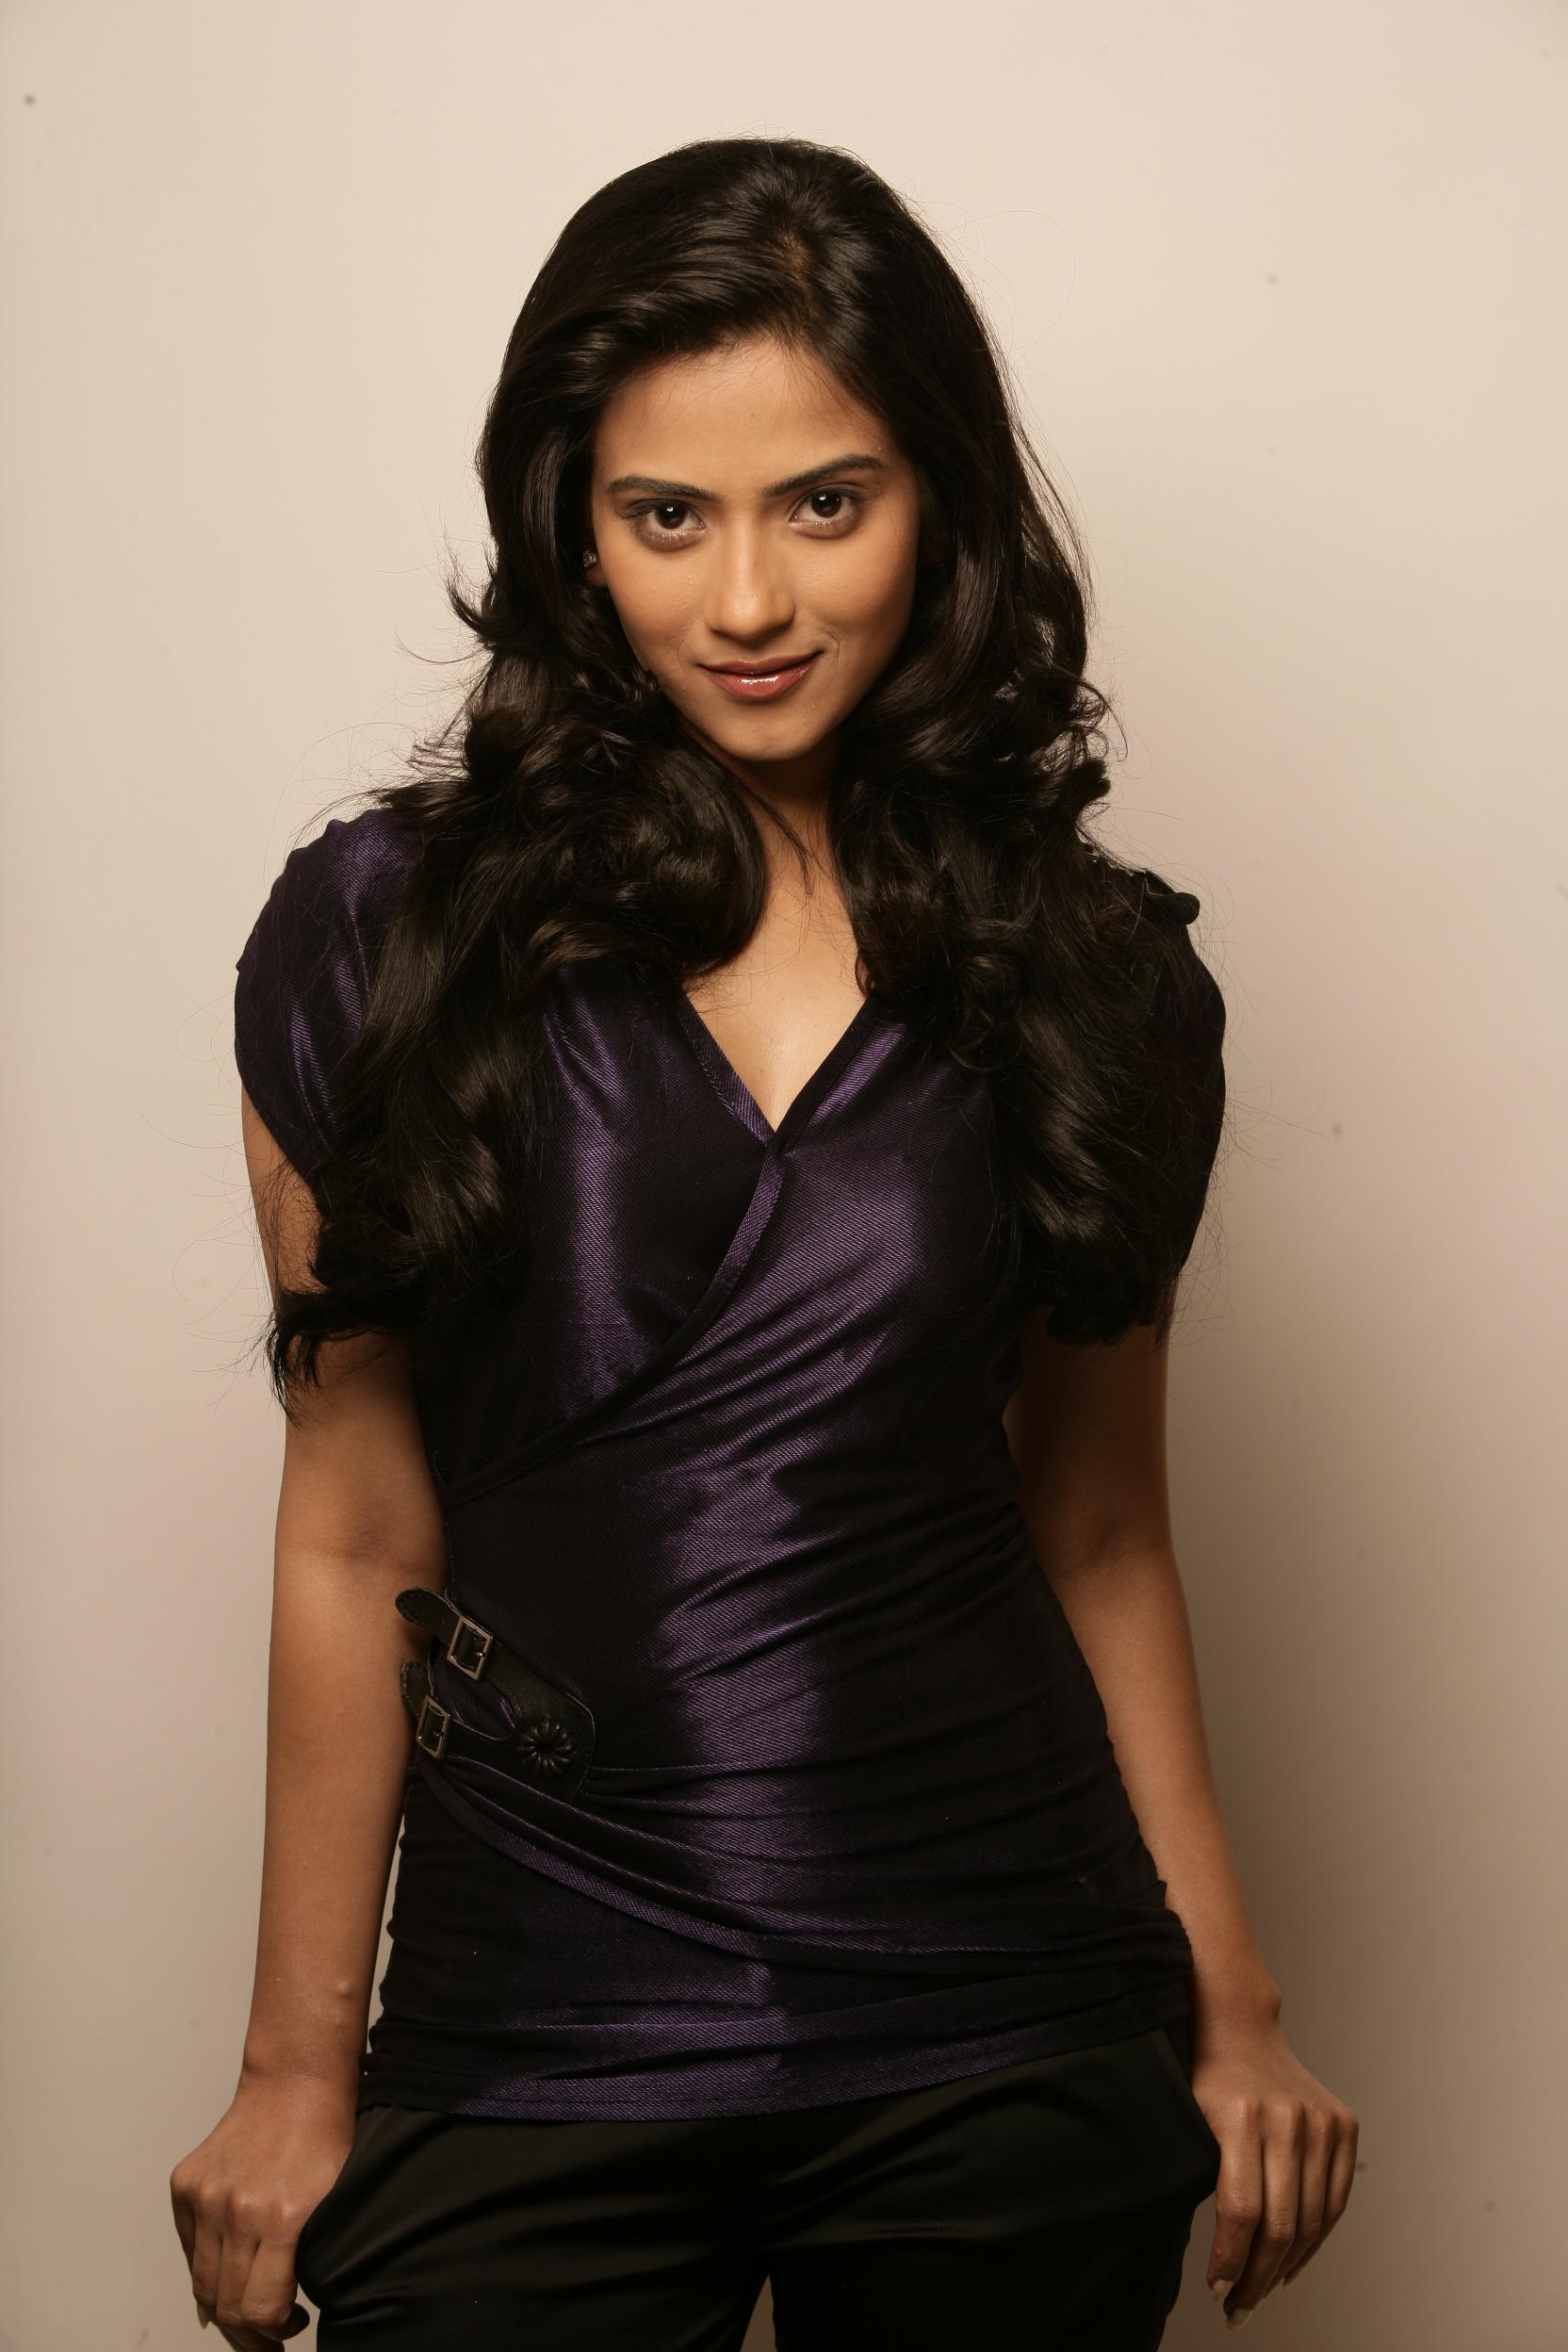 Aditi-Sharma-looking-hot-in-black-dress Aditi Sharma 11+ Unseen Bikini Photograph, Scorching Horny Swimsuit Images Age & Toes Wiki